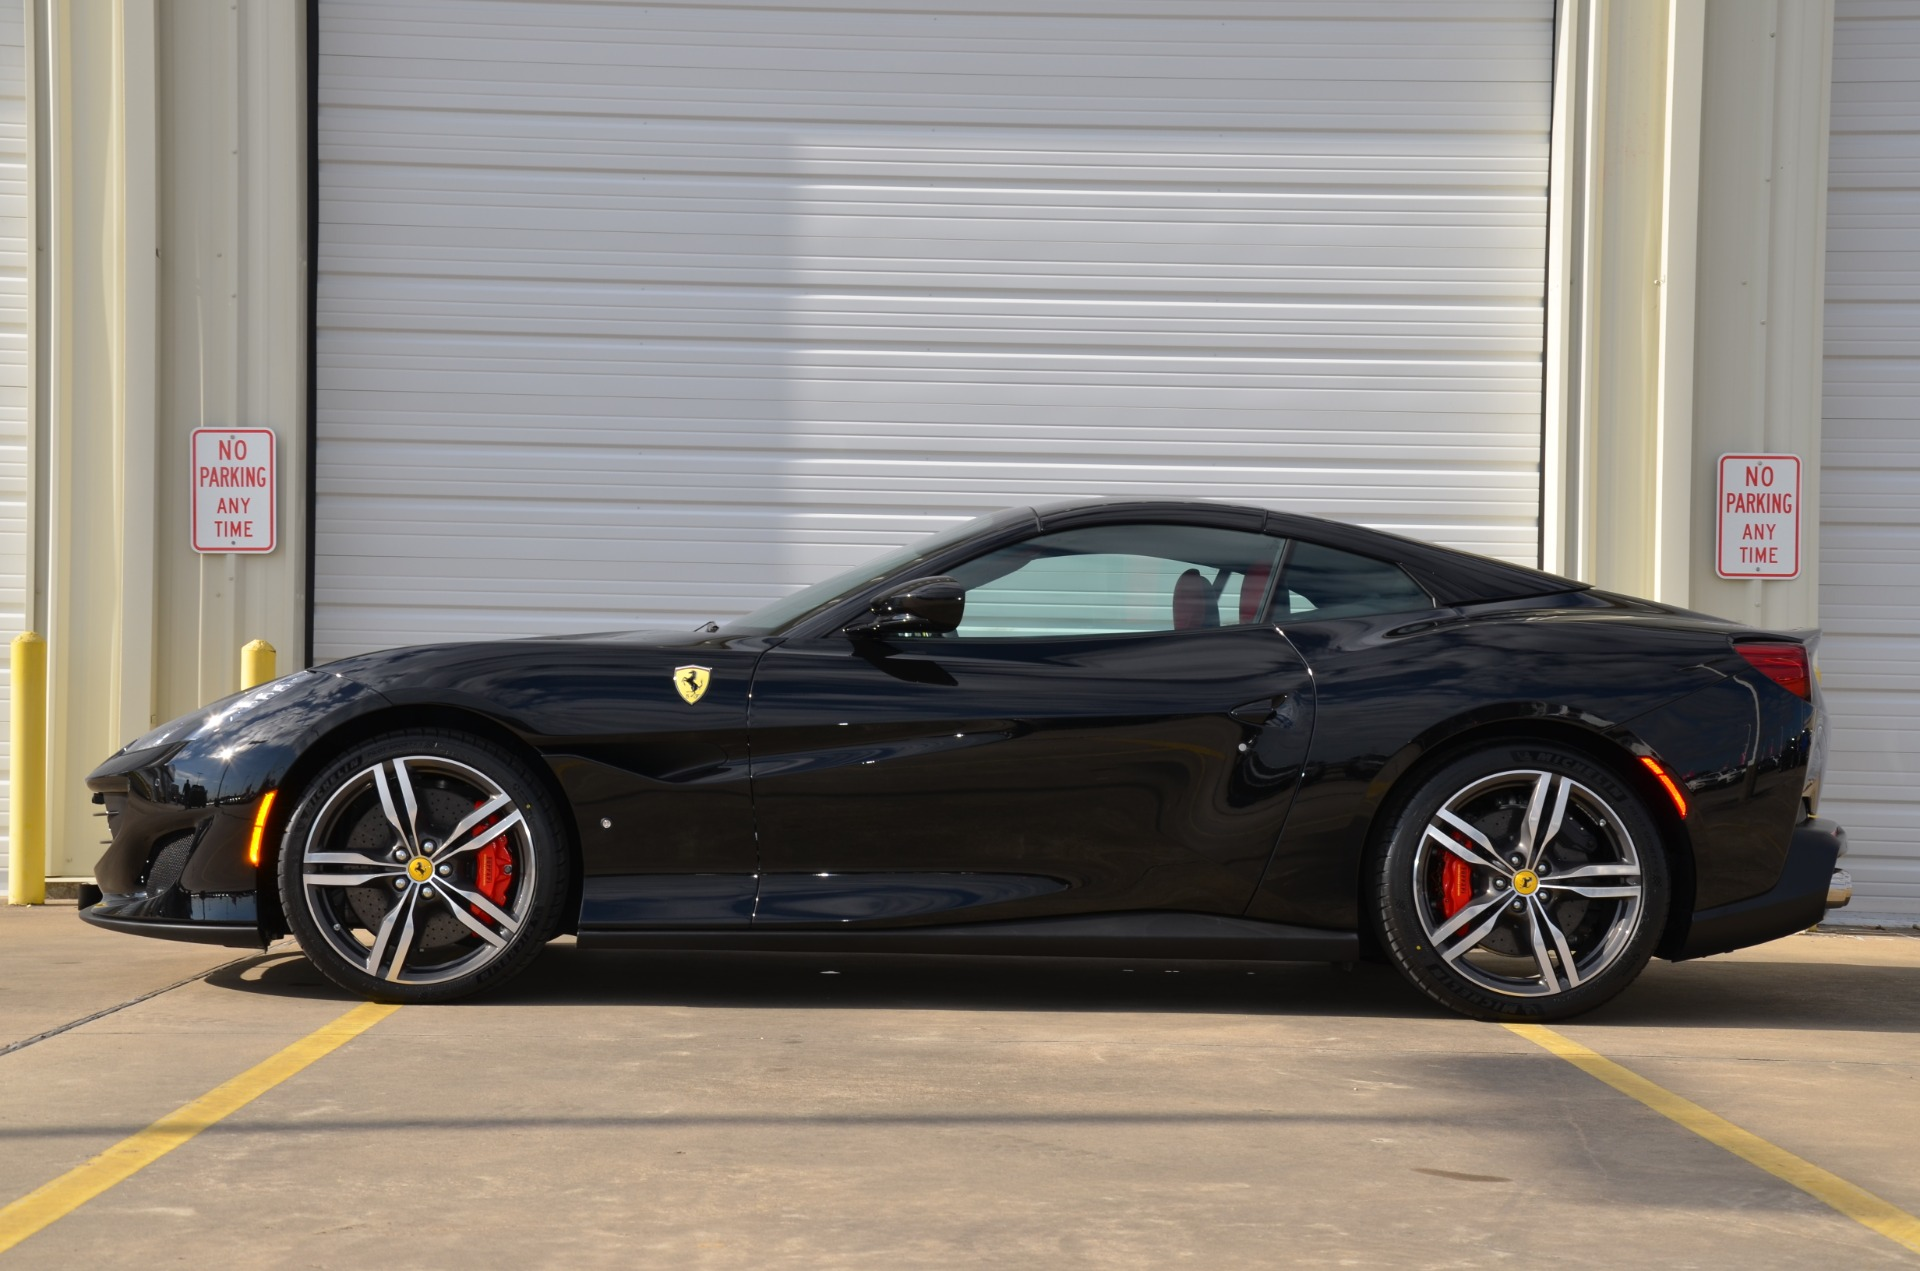 Used 2019 Ferrari Portofino For Sale ($257,690) | BJ ...